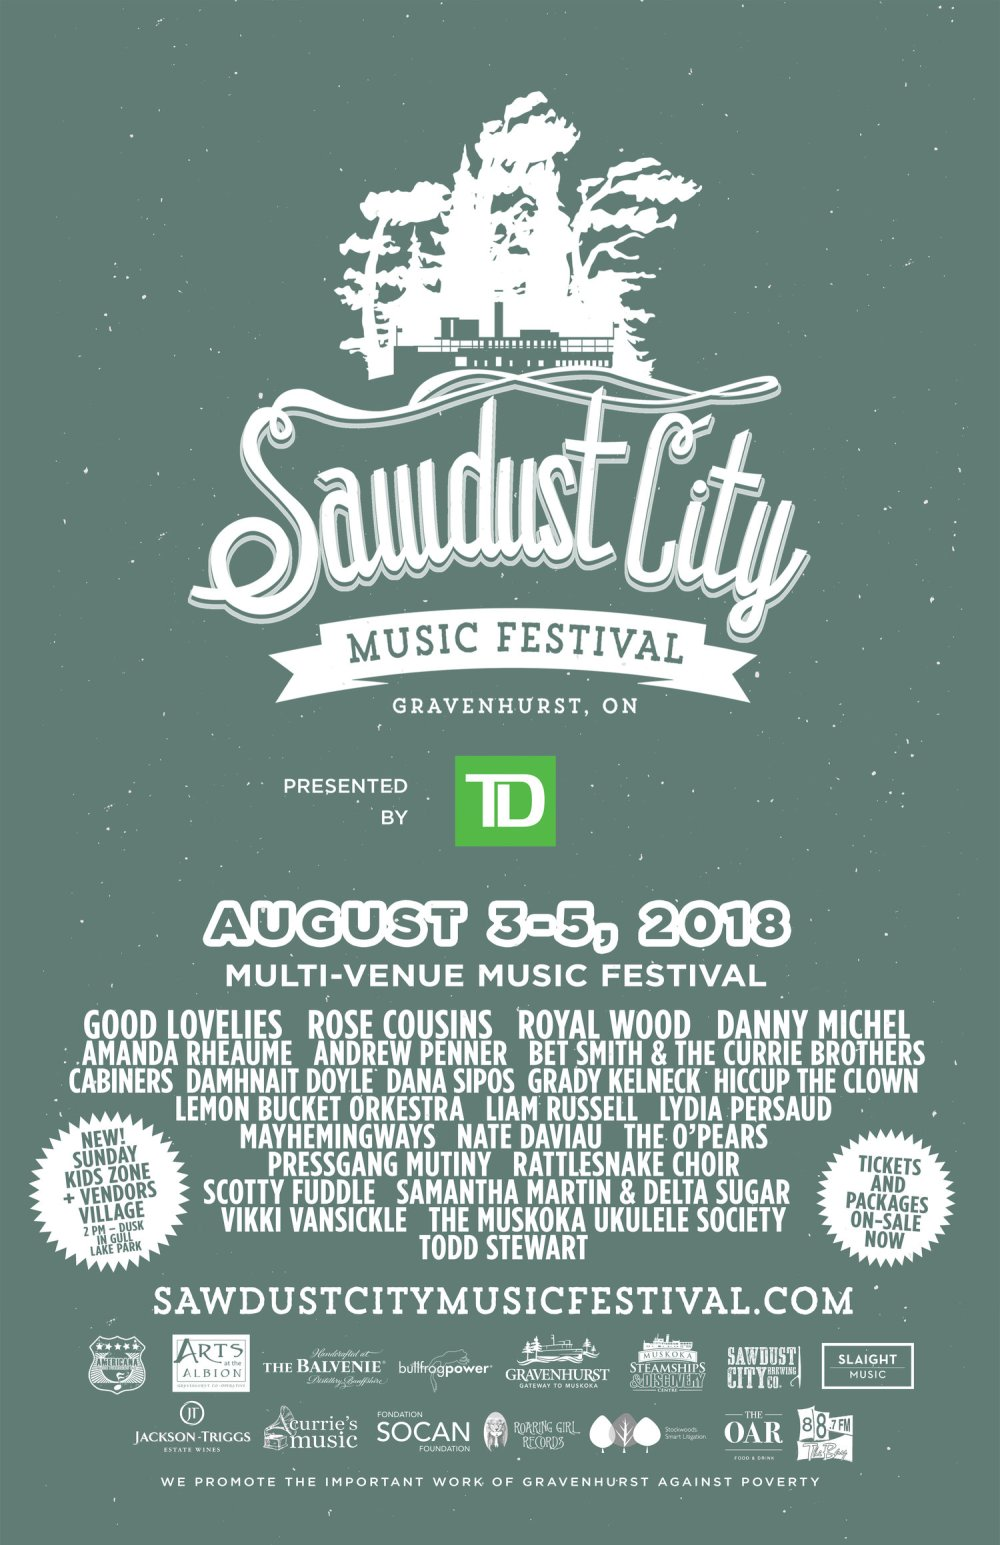 Sawdust city music festival 2018